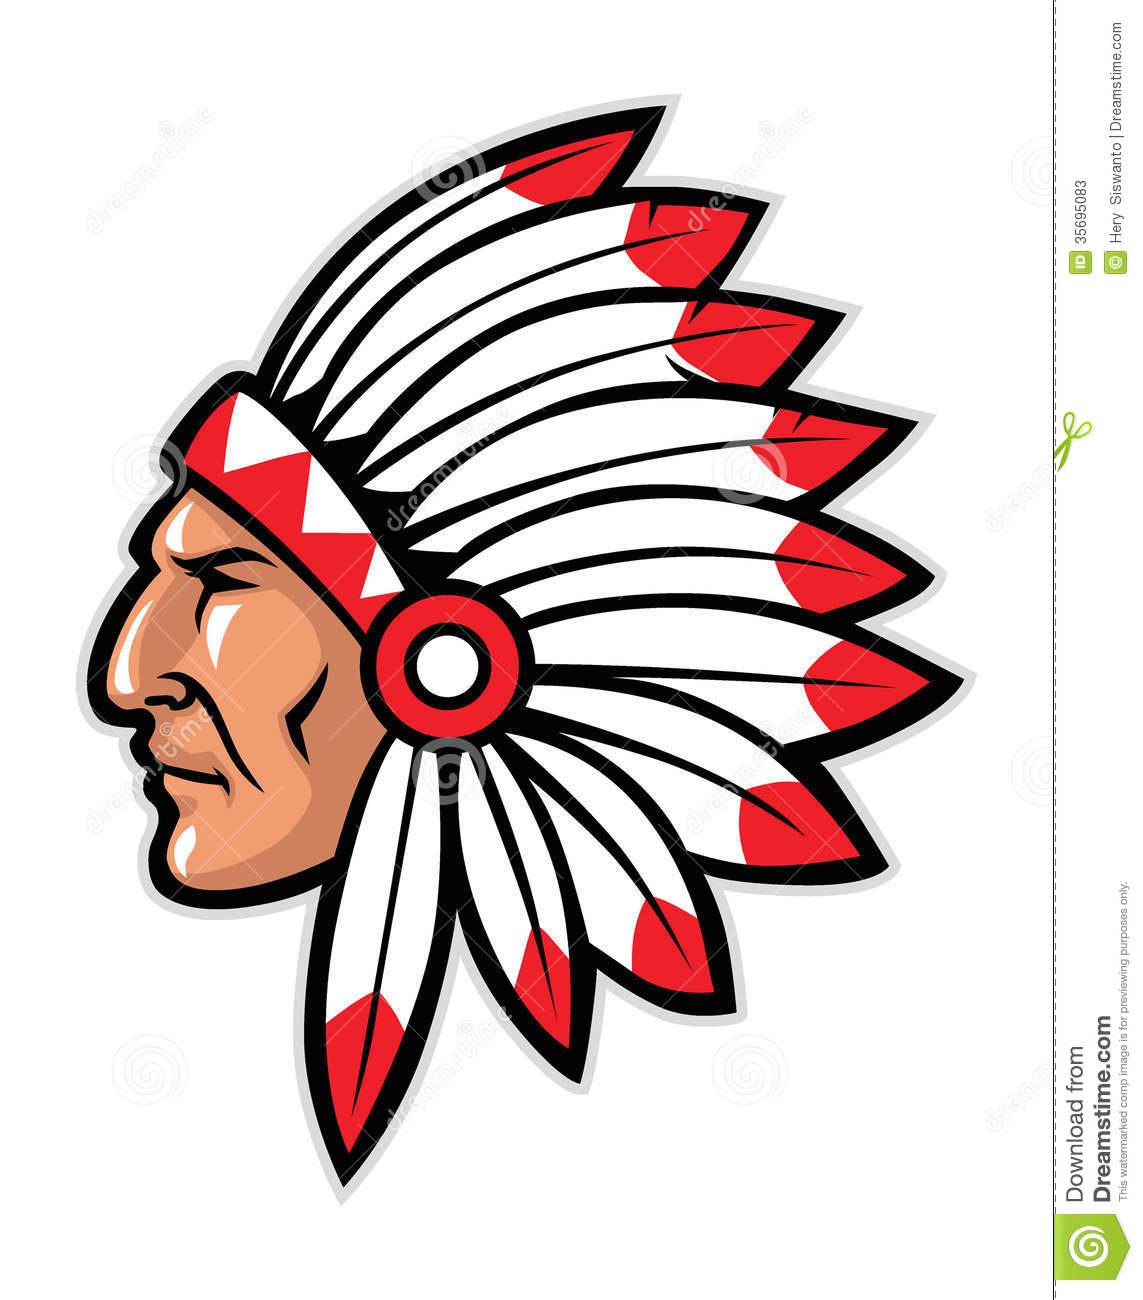 Indian Head Mascot-Indian Head Mascot-0